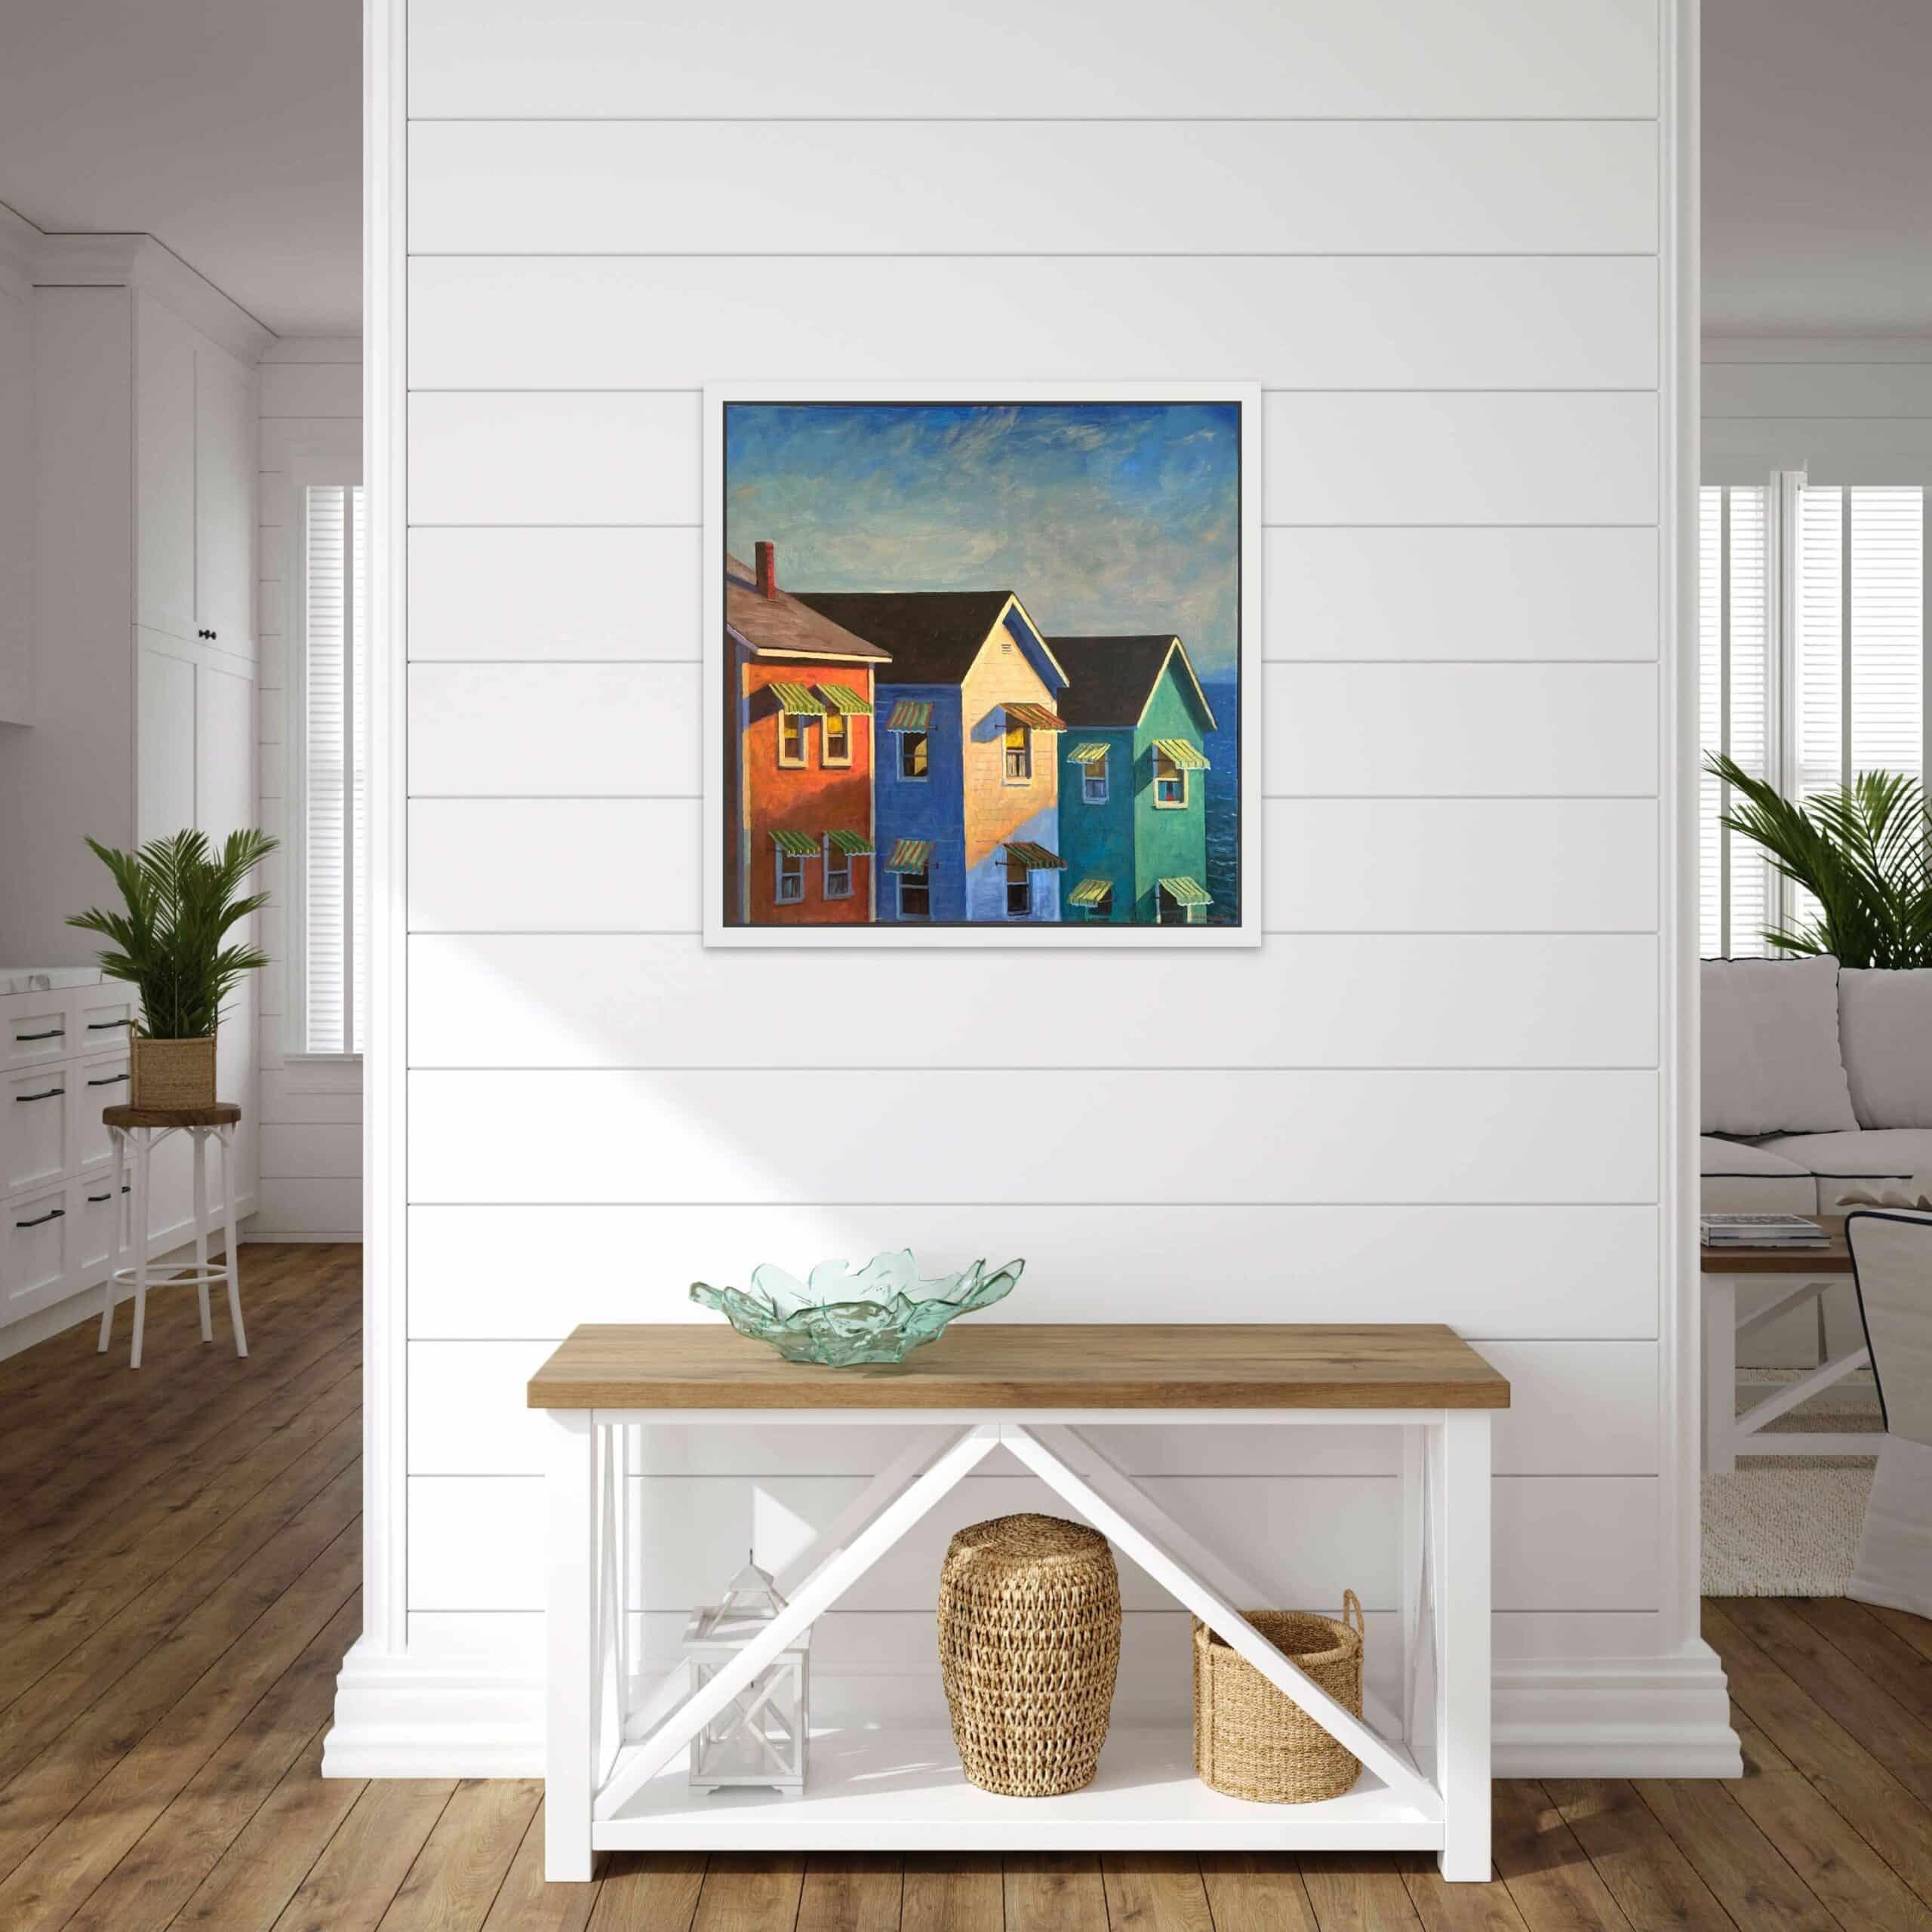 Mark Beck Fine Art Print in art collector's home.